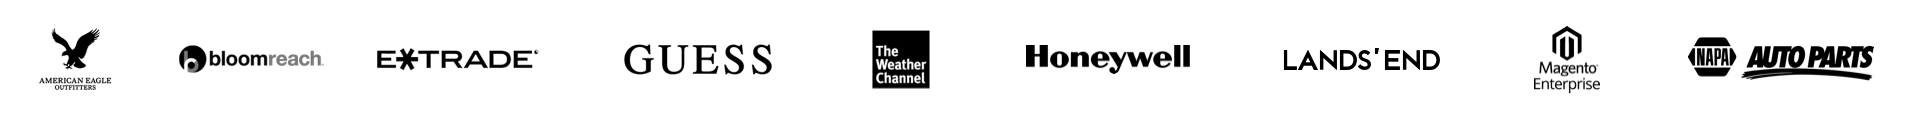 logo parade 2